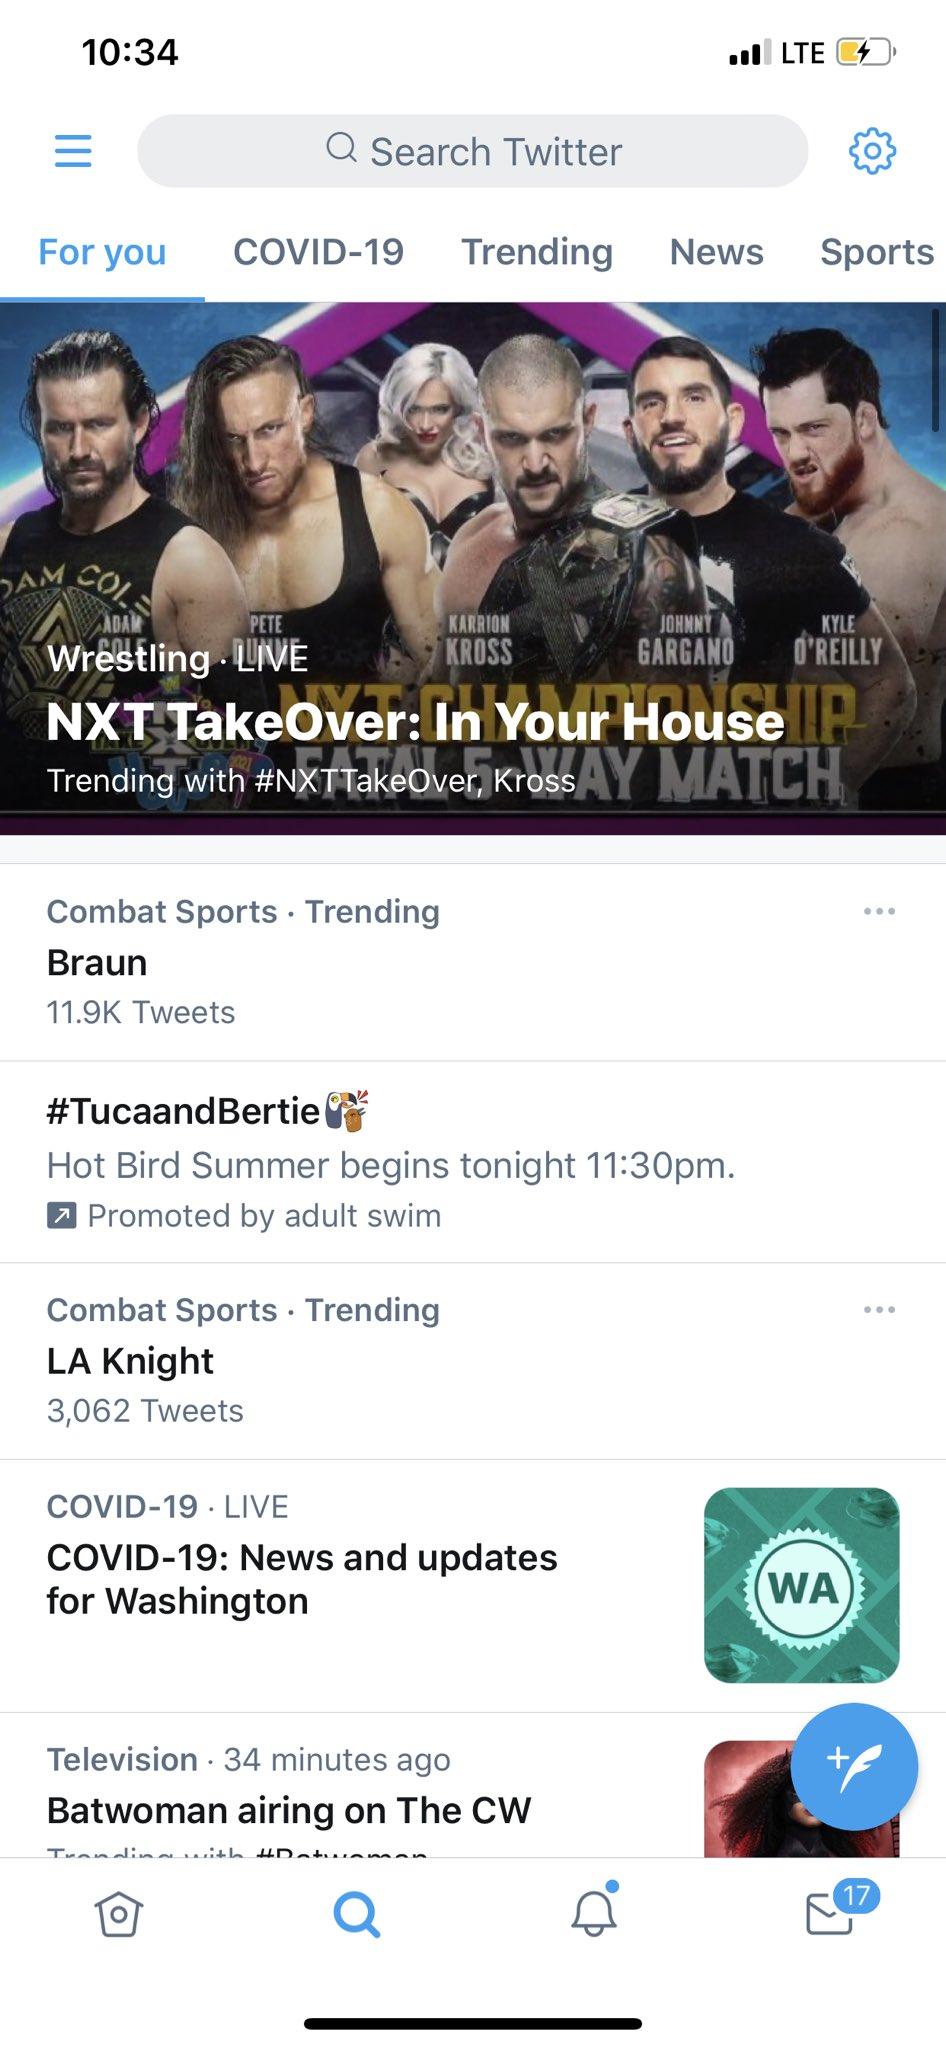 Braun Strowman Defends WWE NXT Women's Champion With Profanity Filled Tweet 37